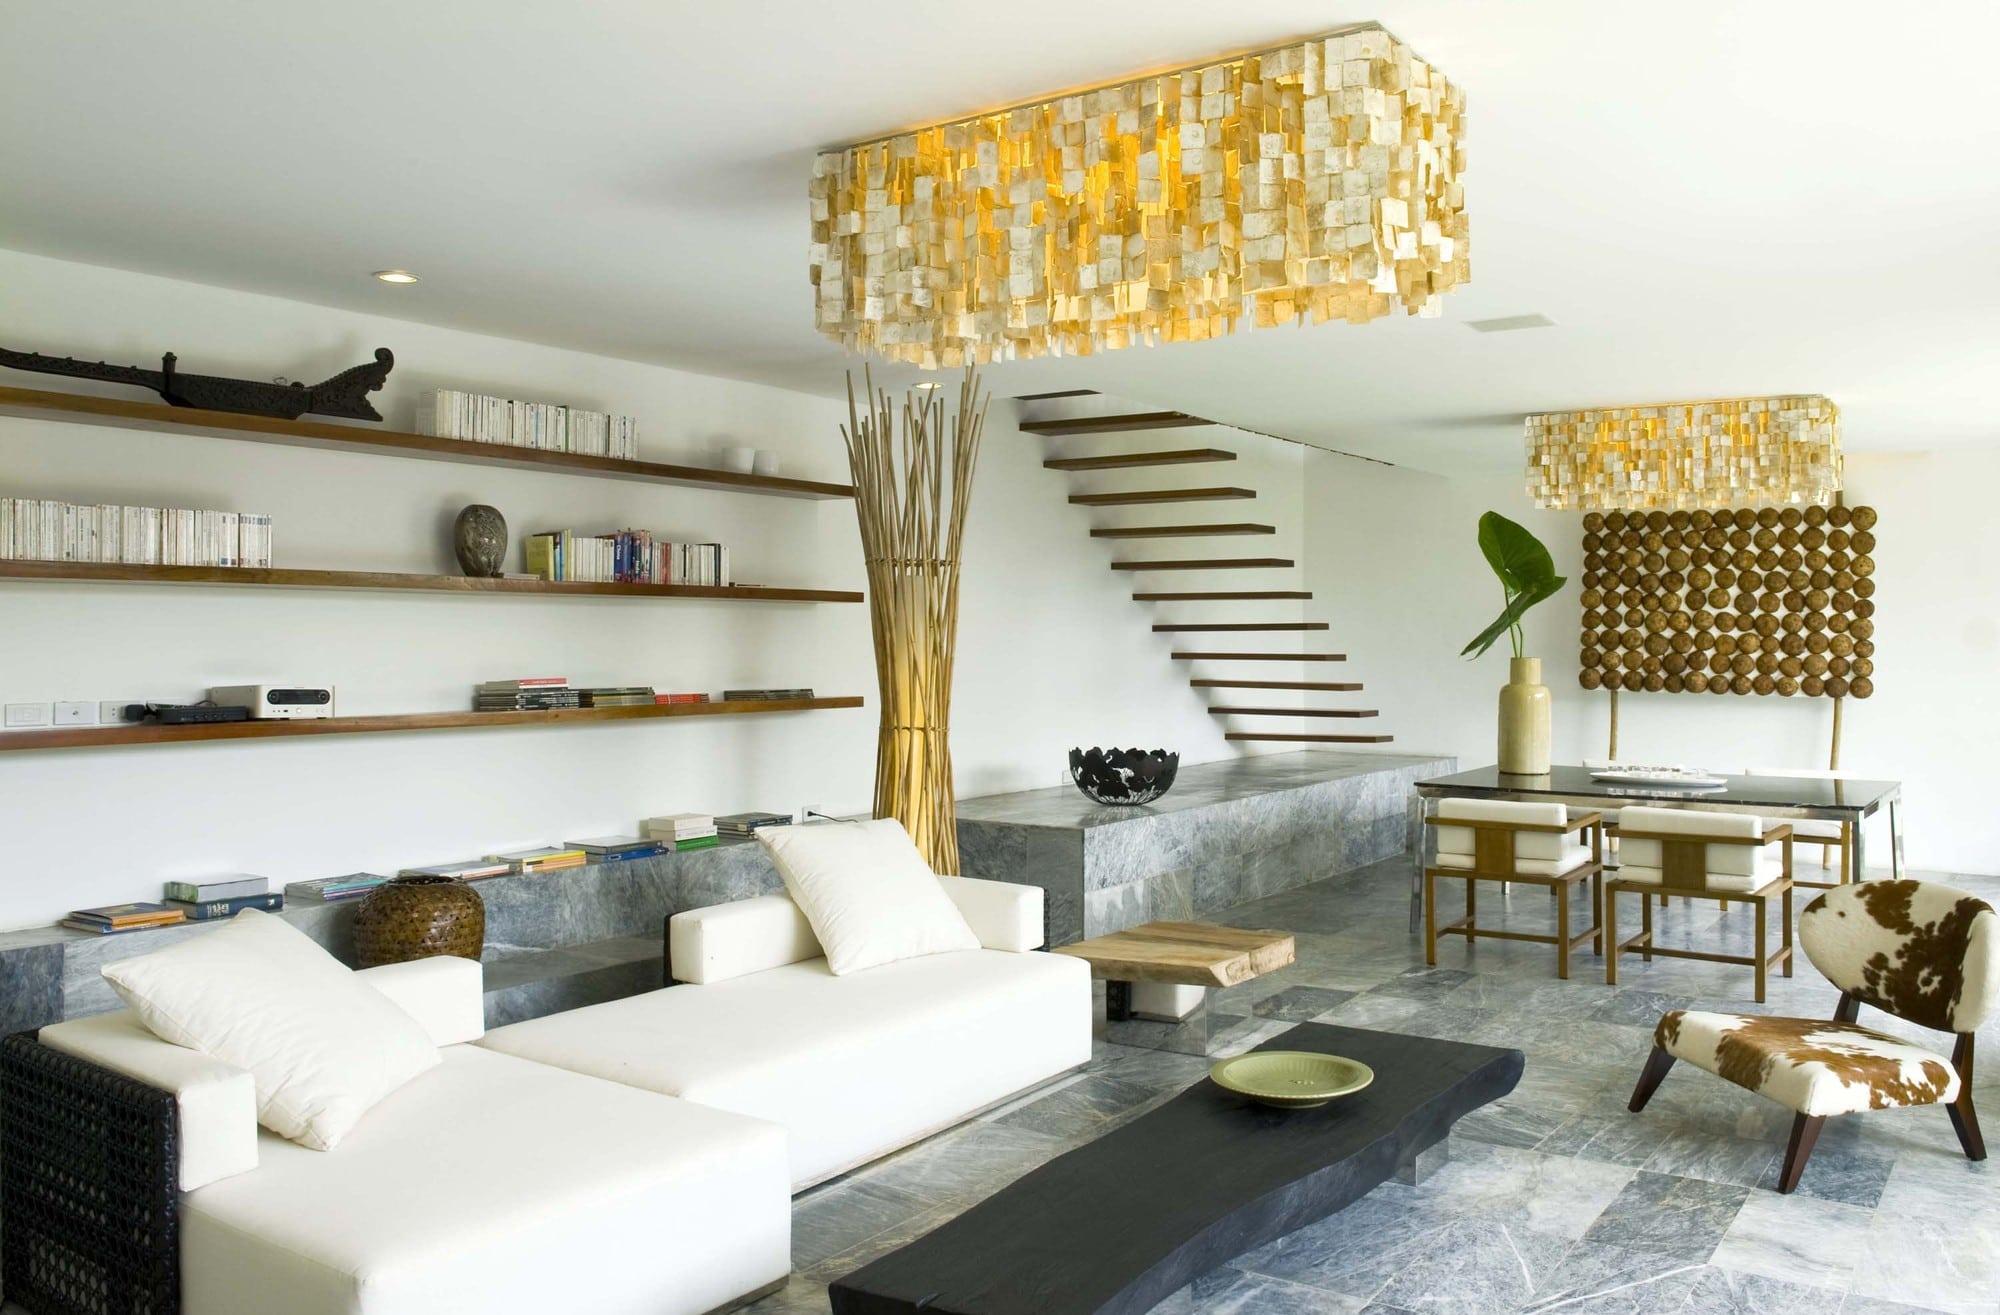 Dise o de casa r stica fachada interiores y planos for Diseno de interiores sala de estar comedor